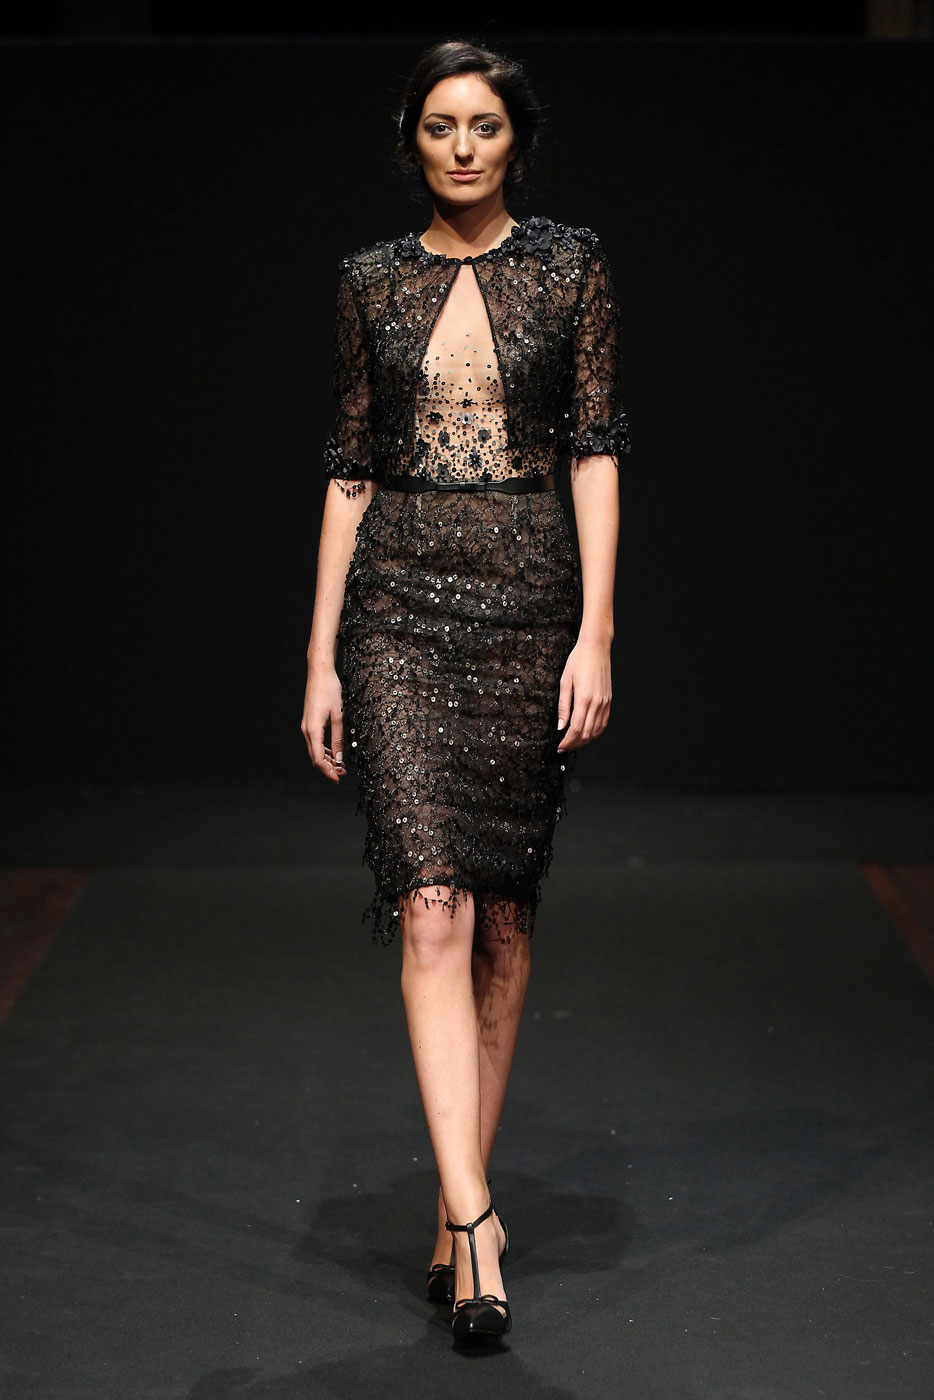 Abed-Mahfouz-fashion-runway-show-haute-couture-paris-spring-2015-the-impression-34